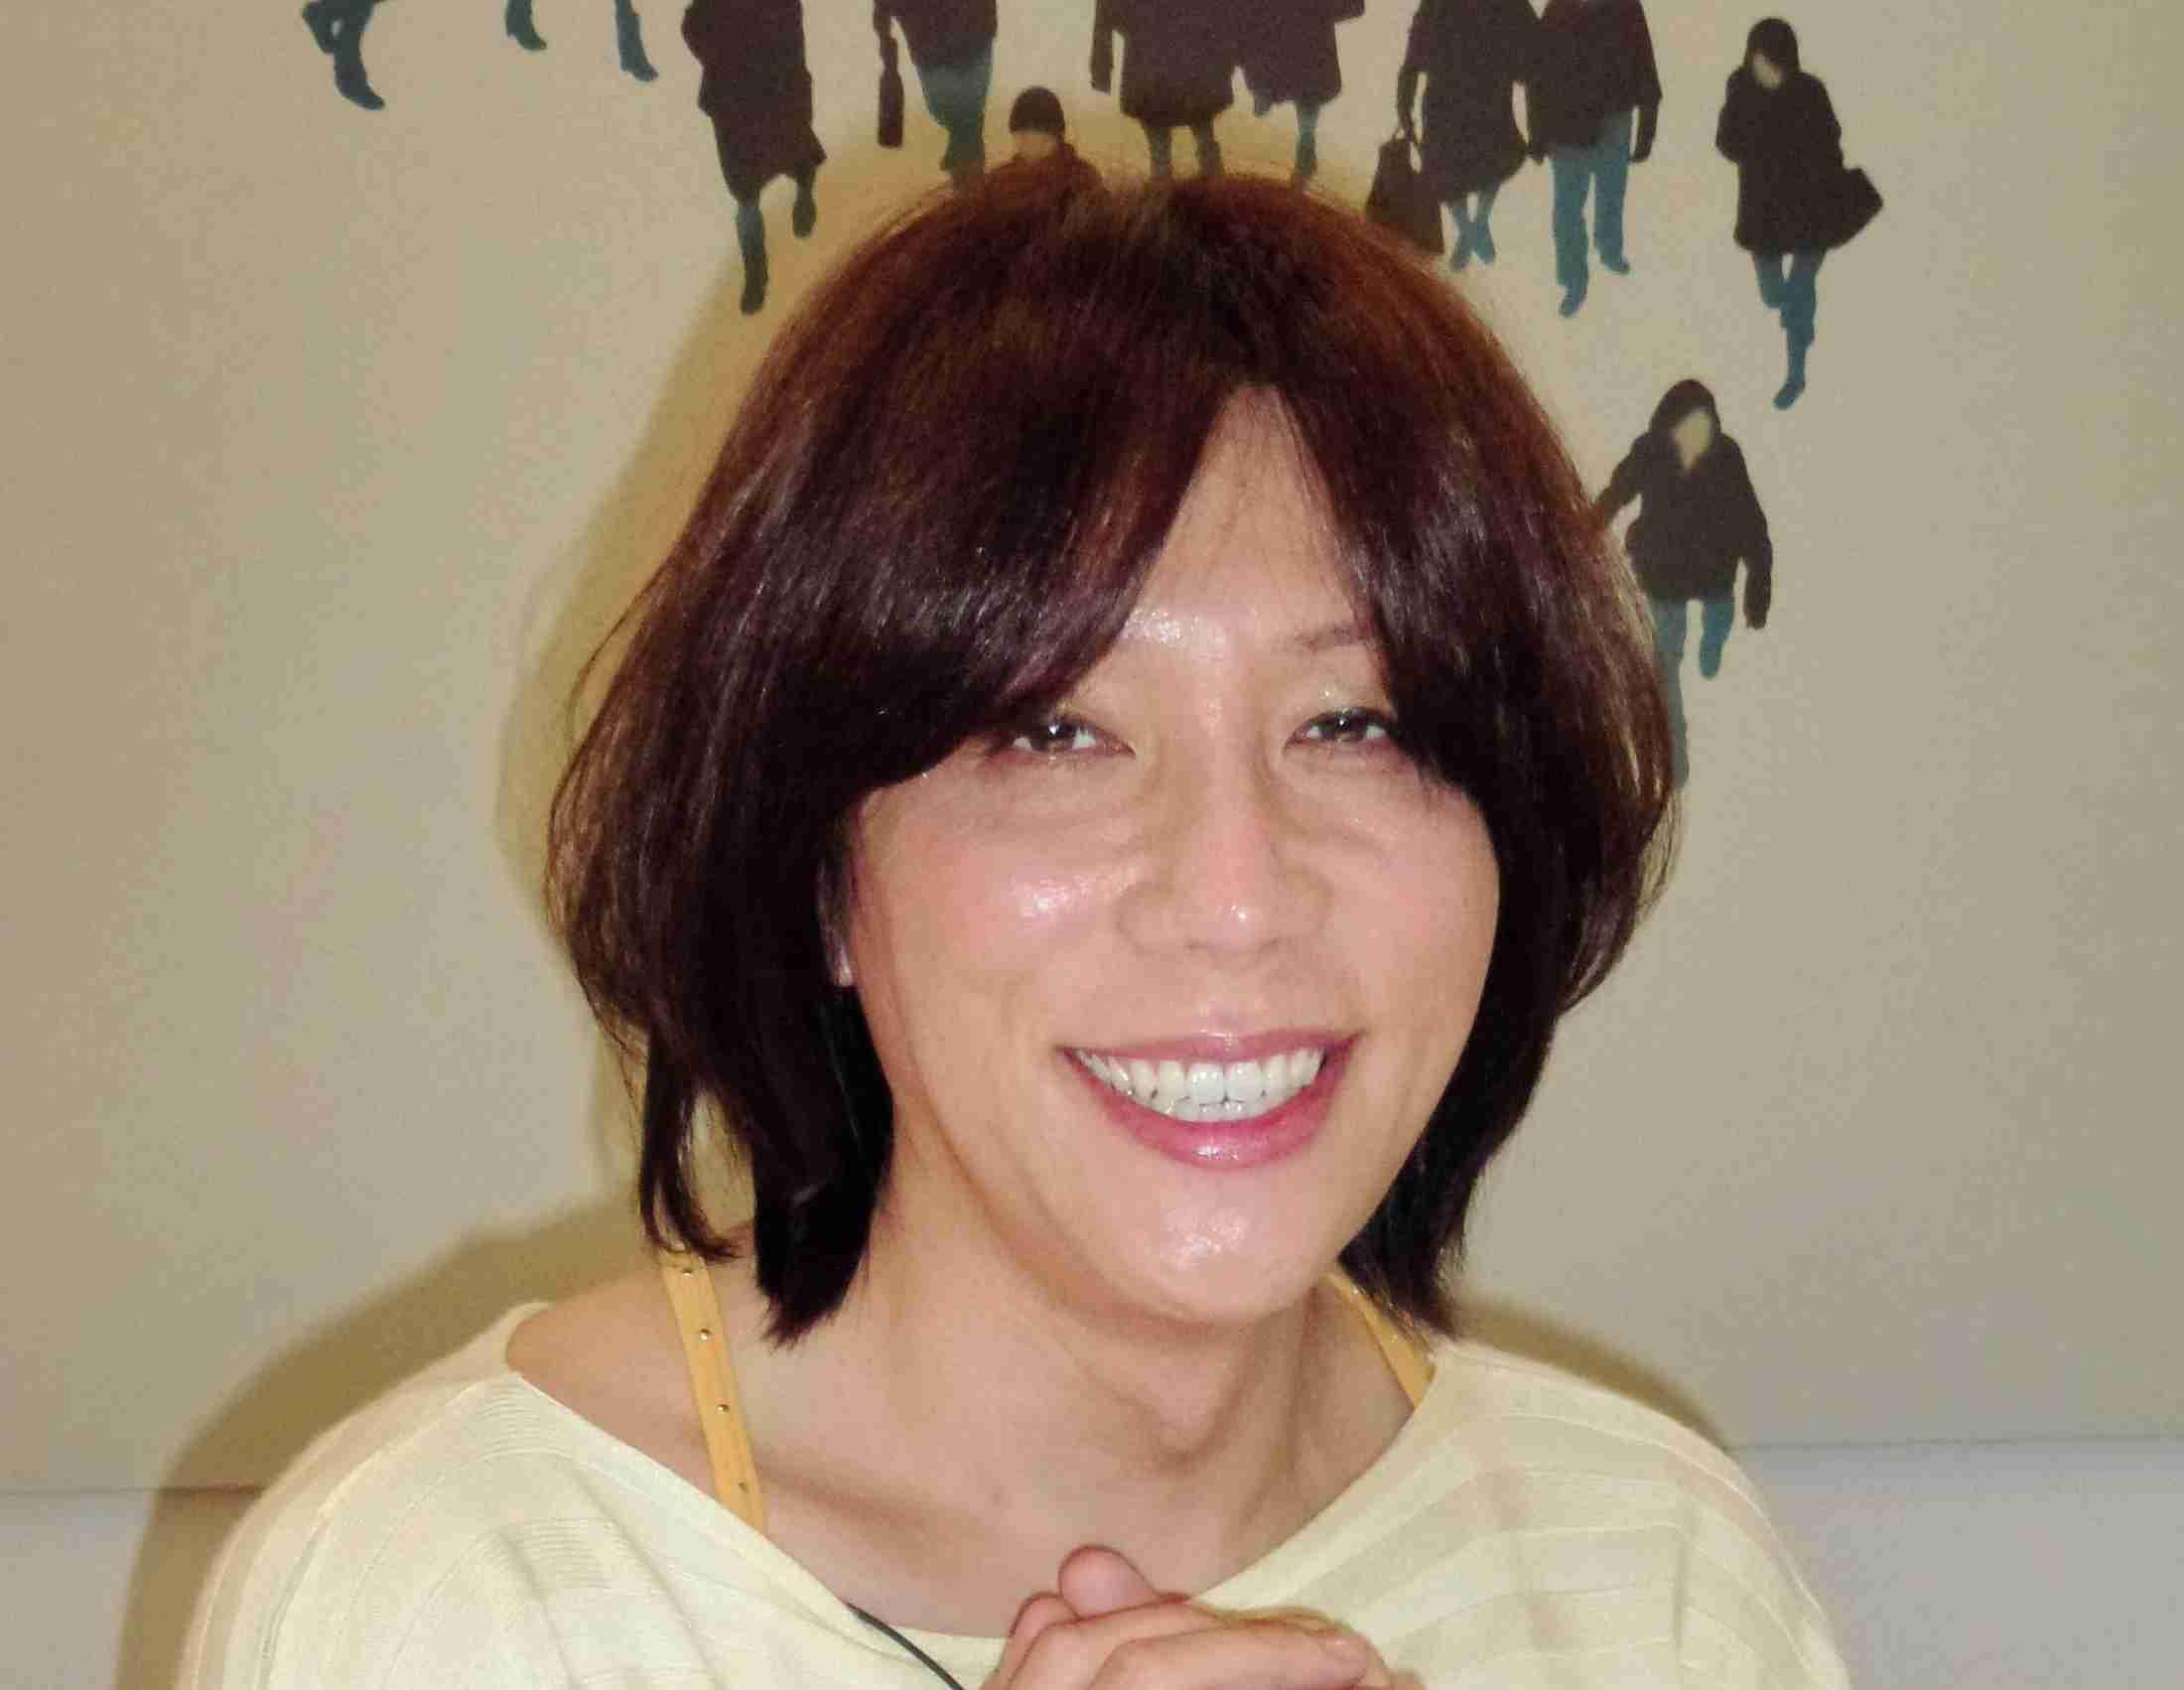 KABA.ちゃん 声の女性化手術に30万 顔だけで高級車1台、その他200万 (デイリースポーツ) - Yahoo!ニュース